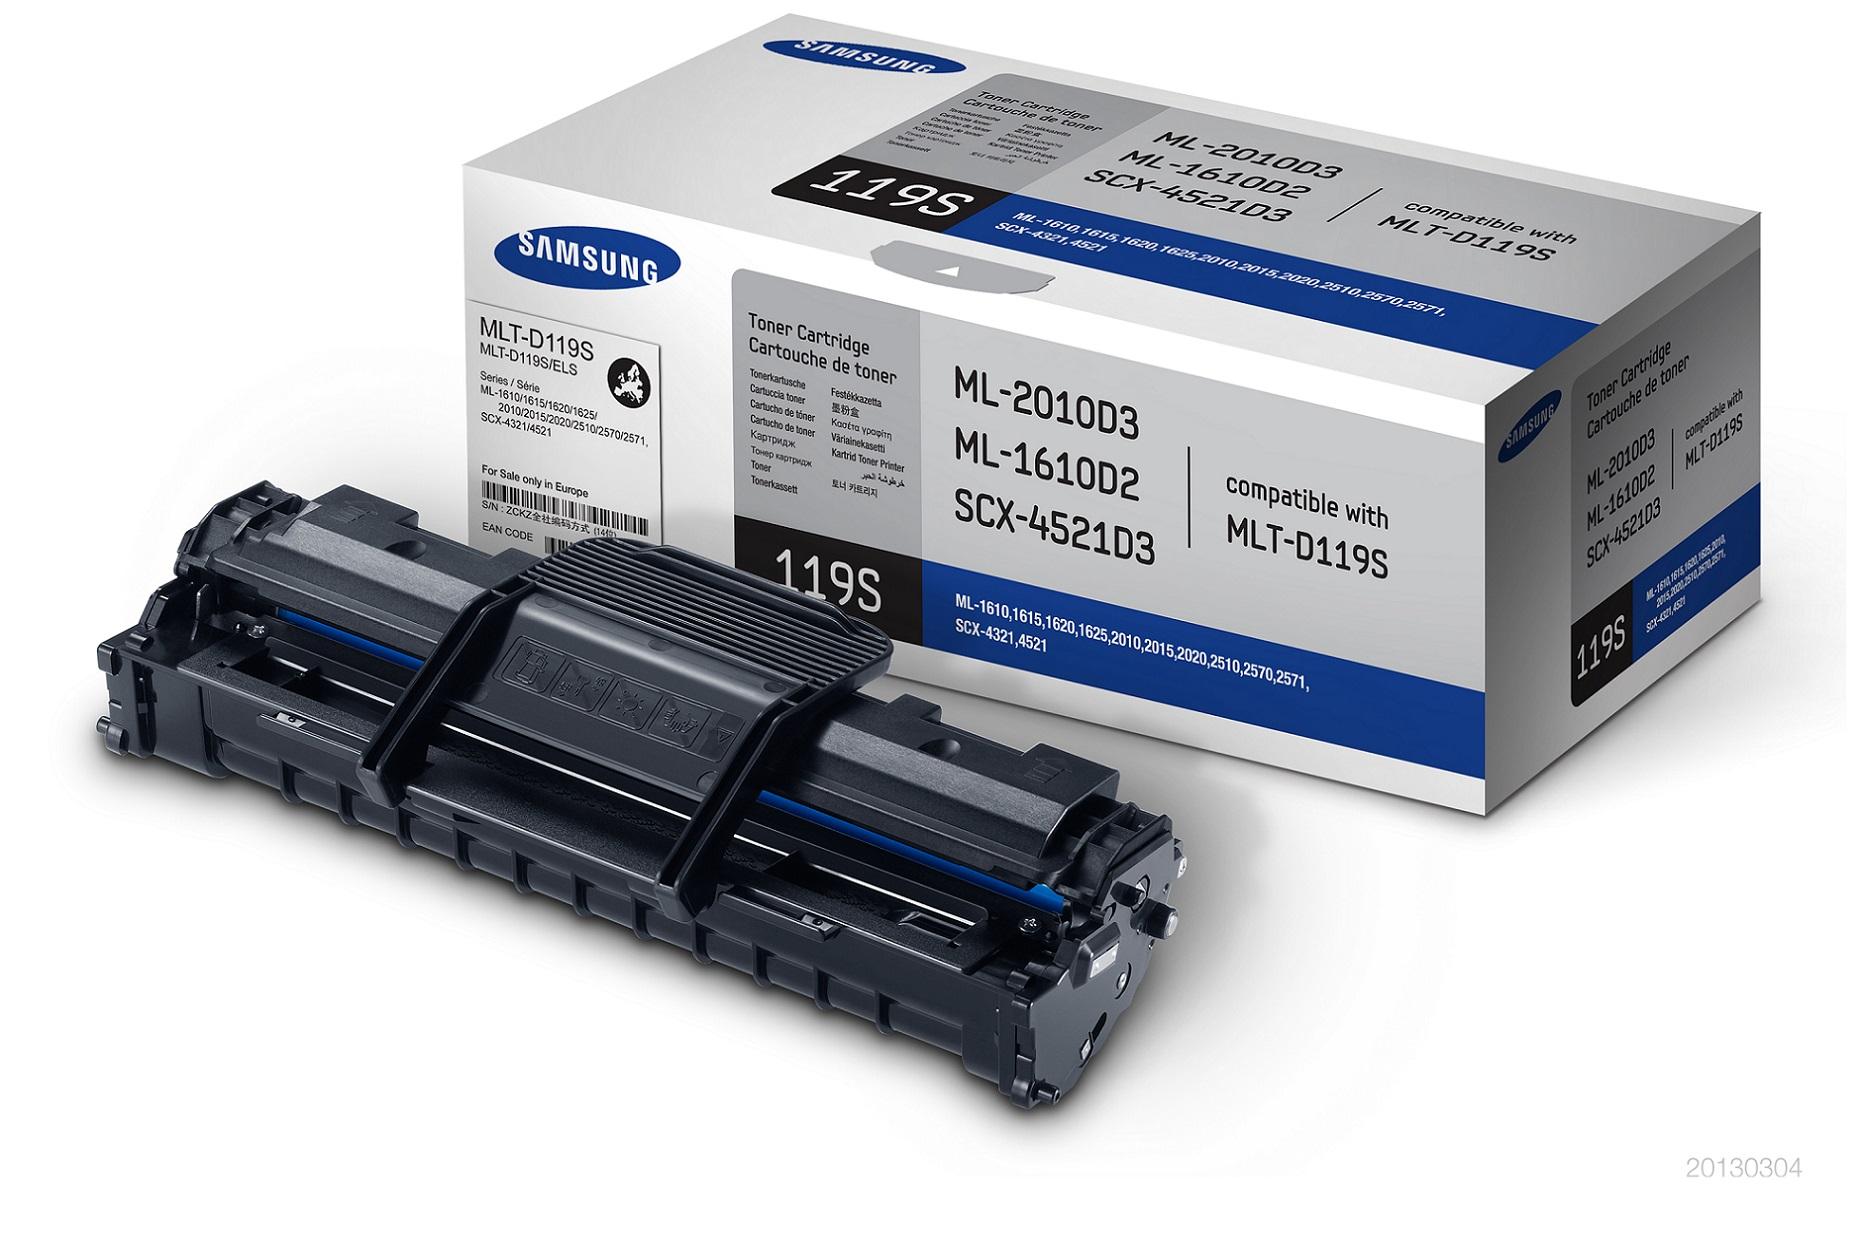 Samsung toner černý MLT - D119S pro SCX-4321/4521/ML-2010/2510/2570.. - 2000 str.